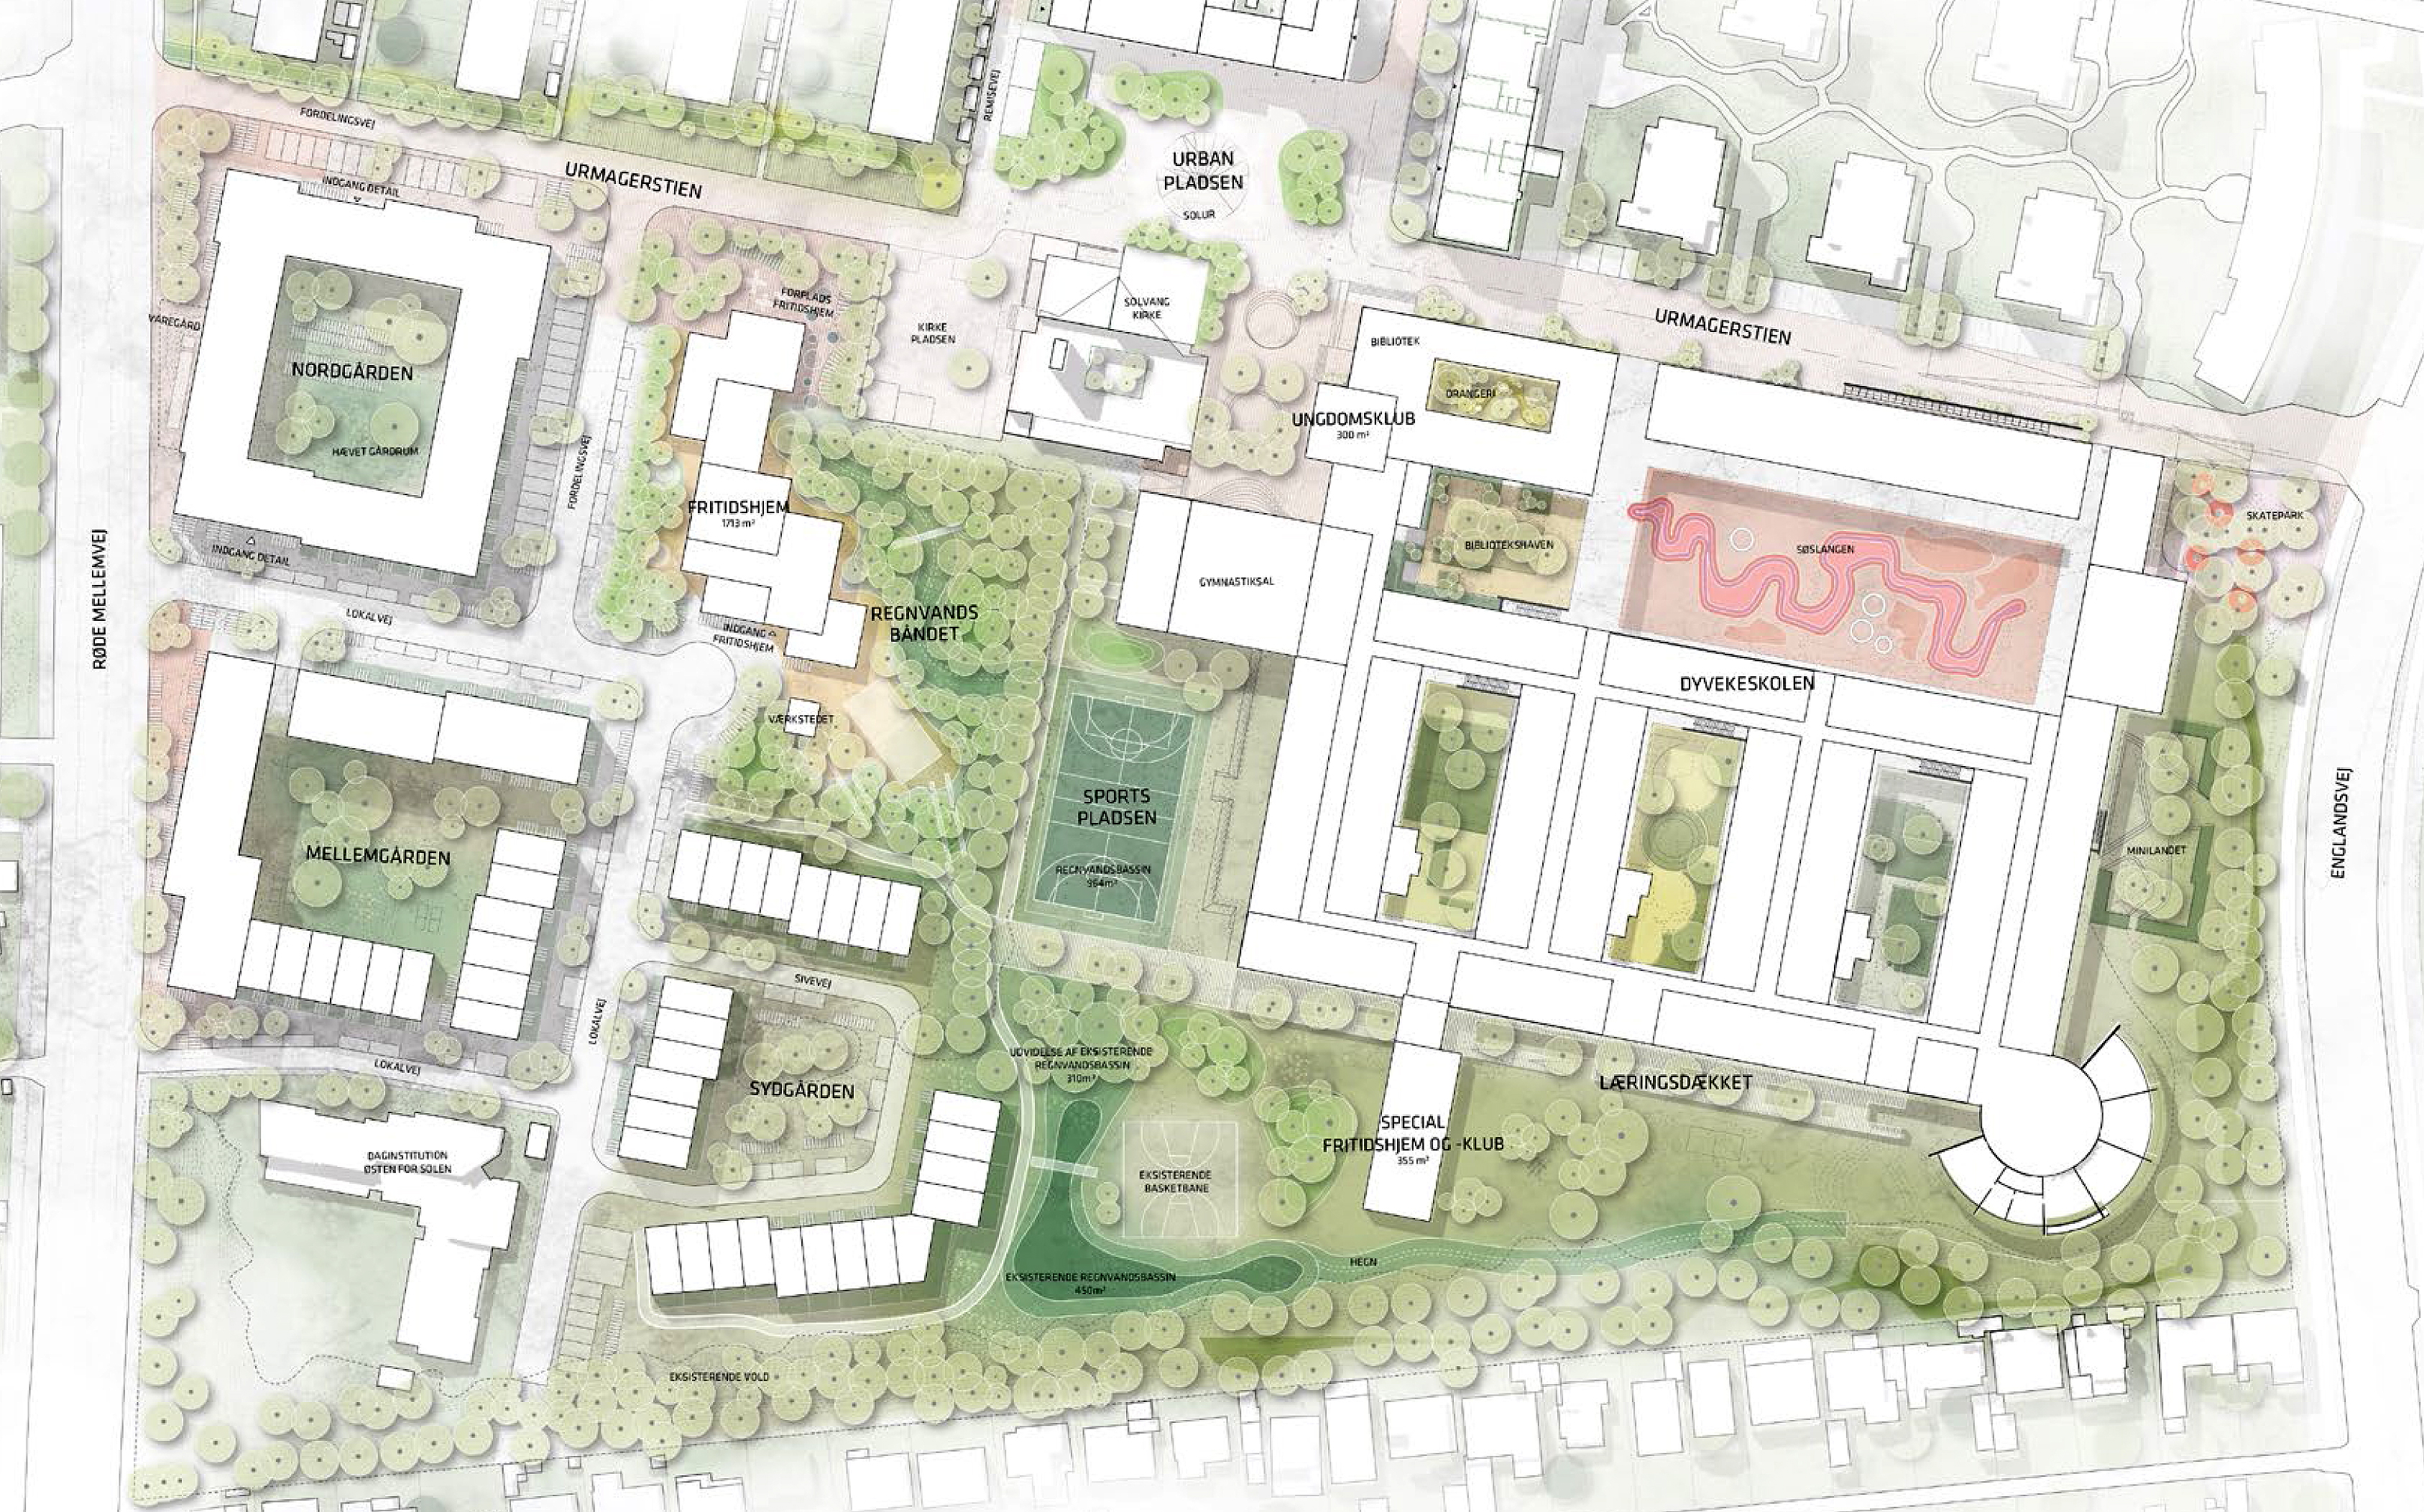 Urbanplanen Syd oversigt